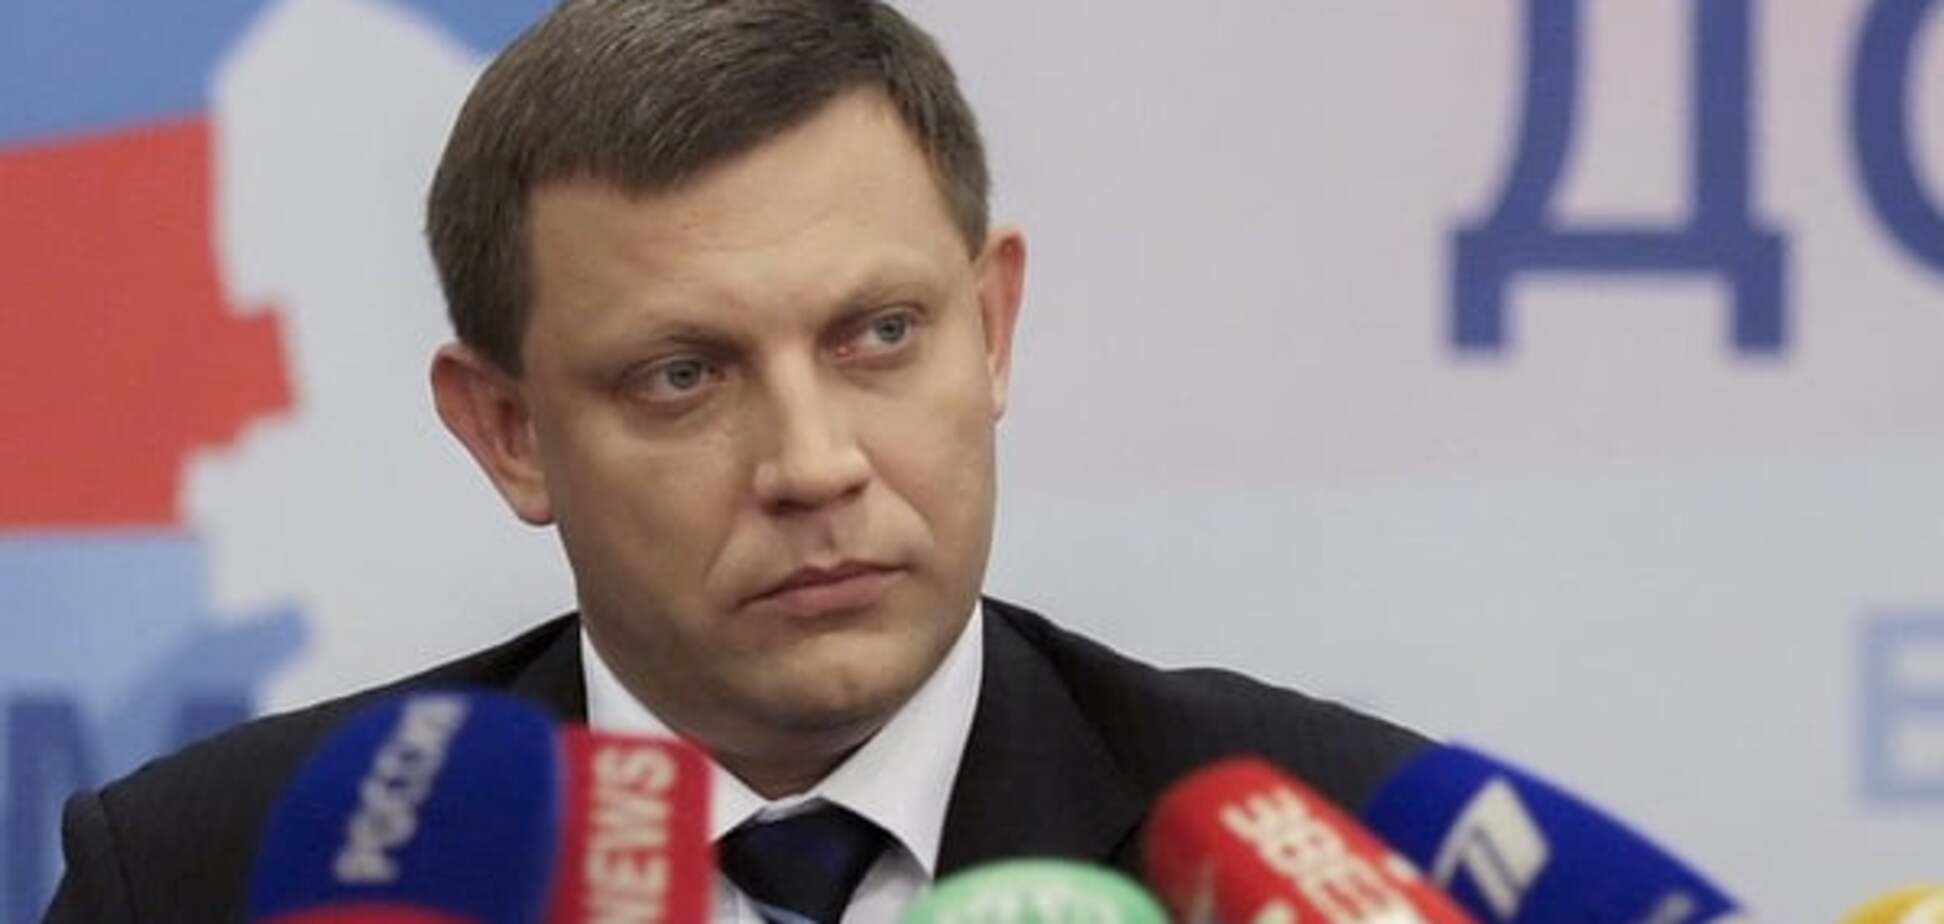 Захарченко побачив Україну 'у складі' Донбасу